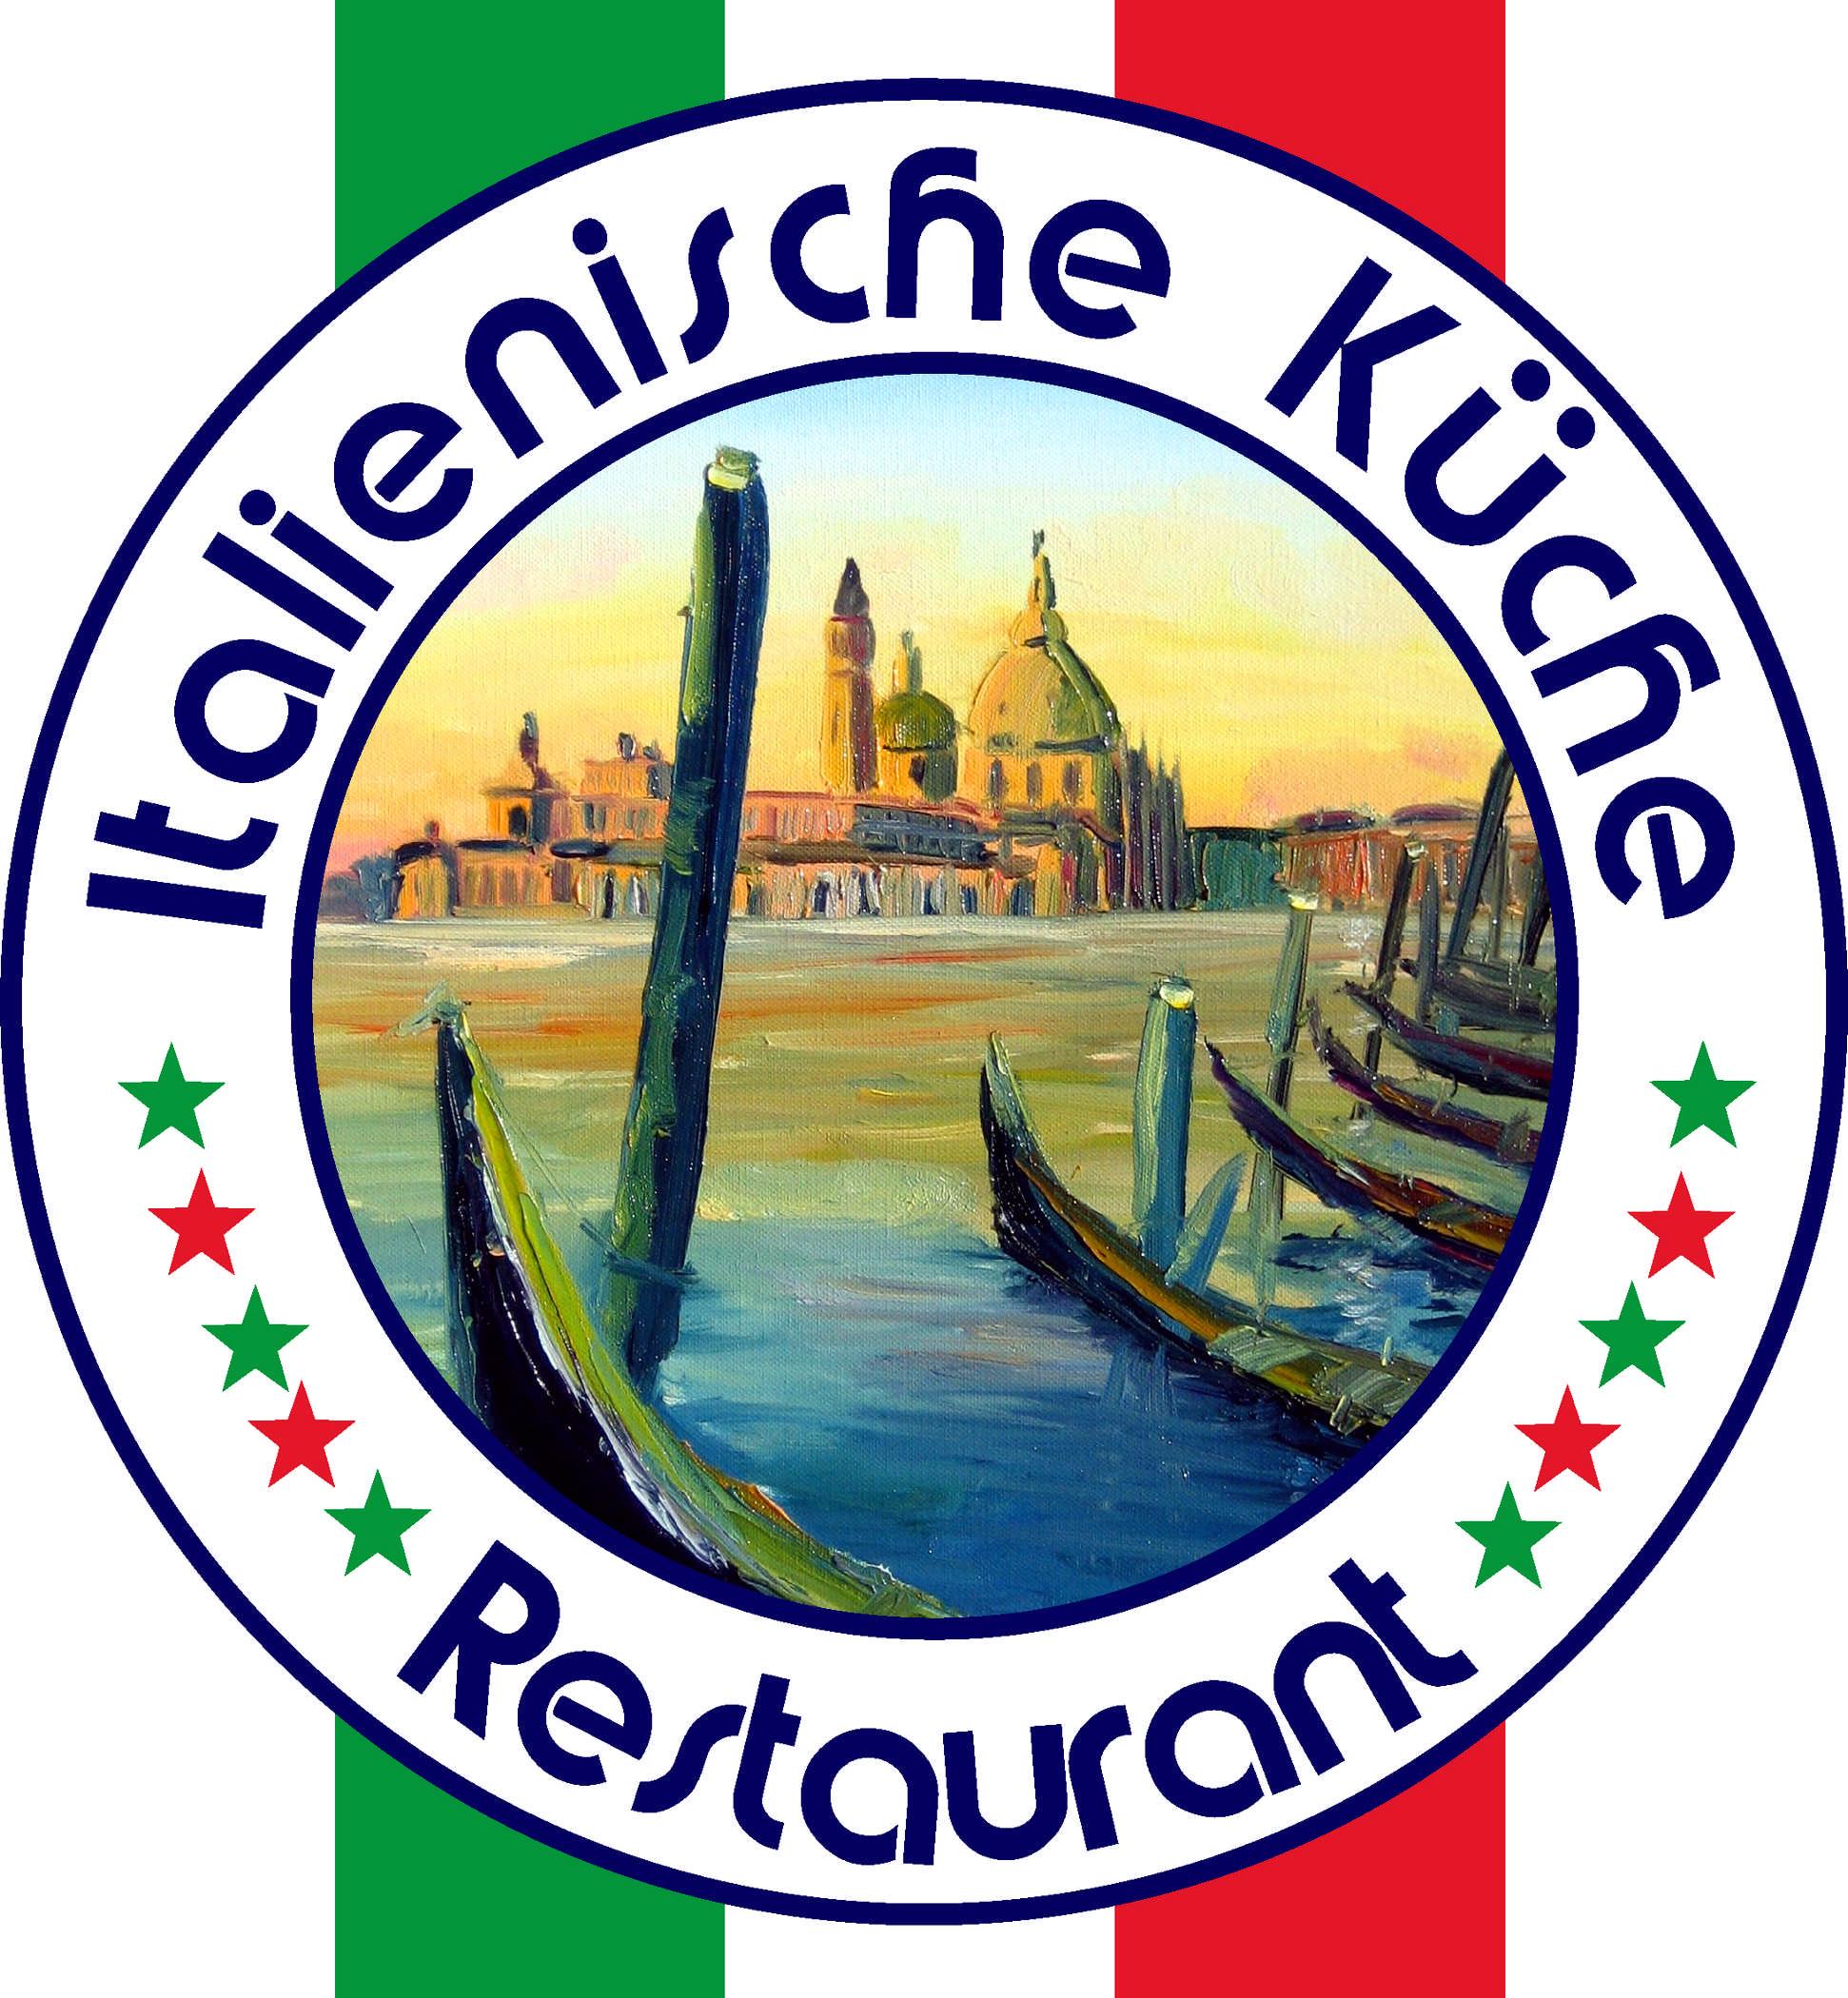 Logo italienische Küche Restaurant Venezia Painting Van Gogh - Oil ...